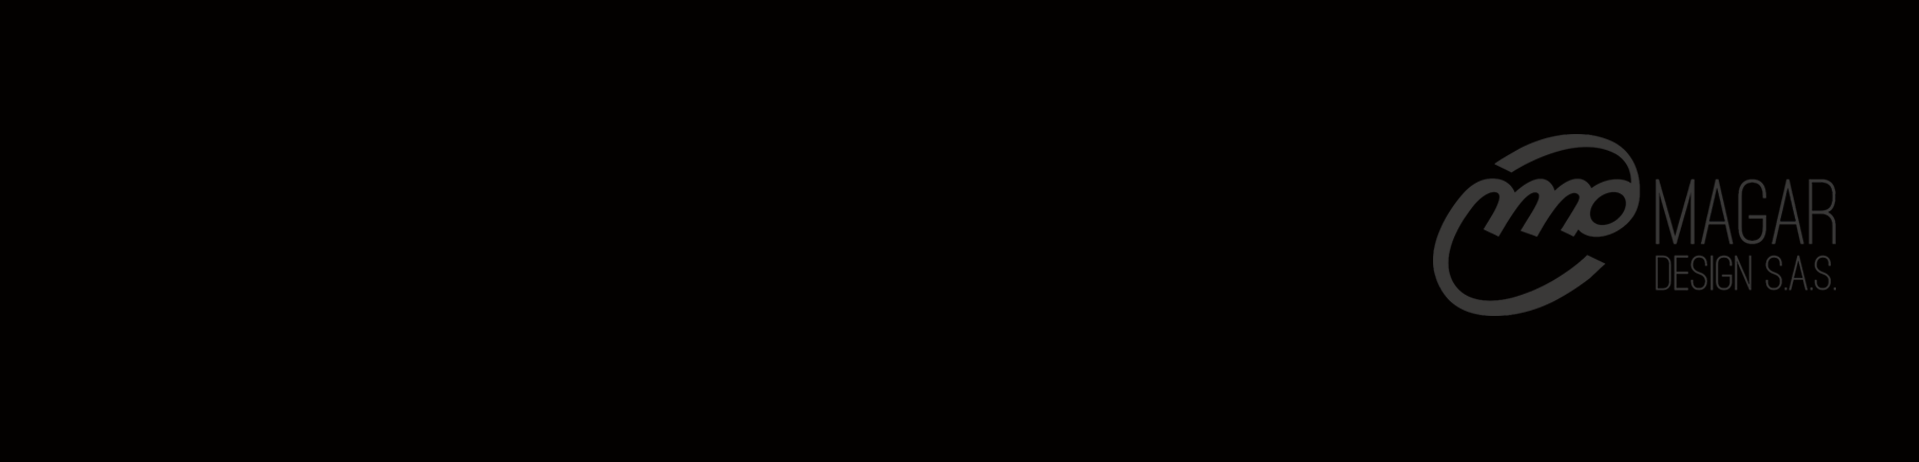 ELEMENTO-2-FONDO-NEGRO-LOGO